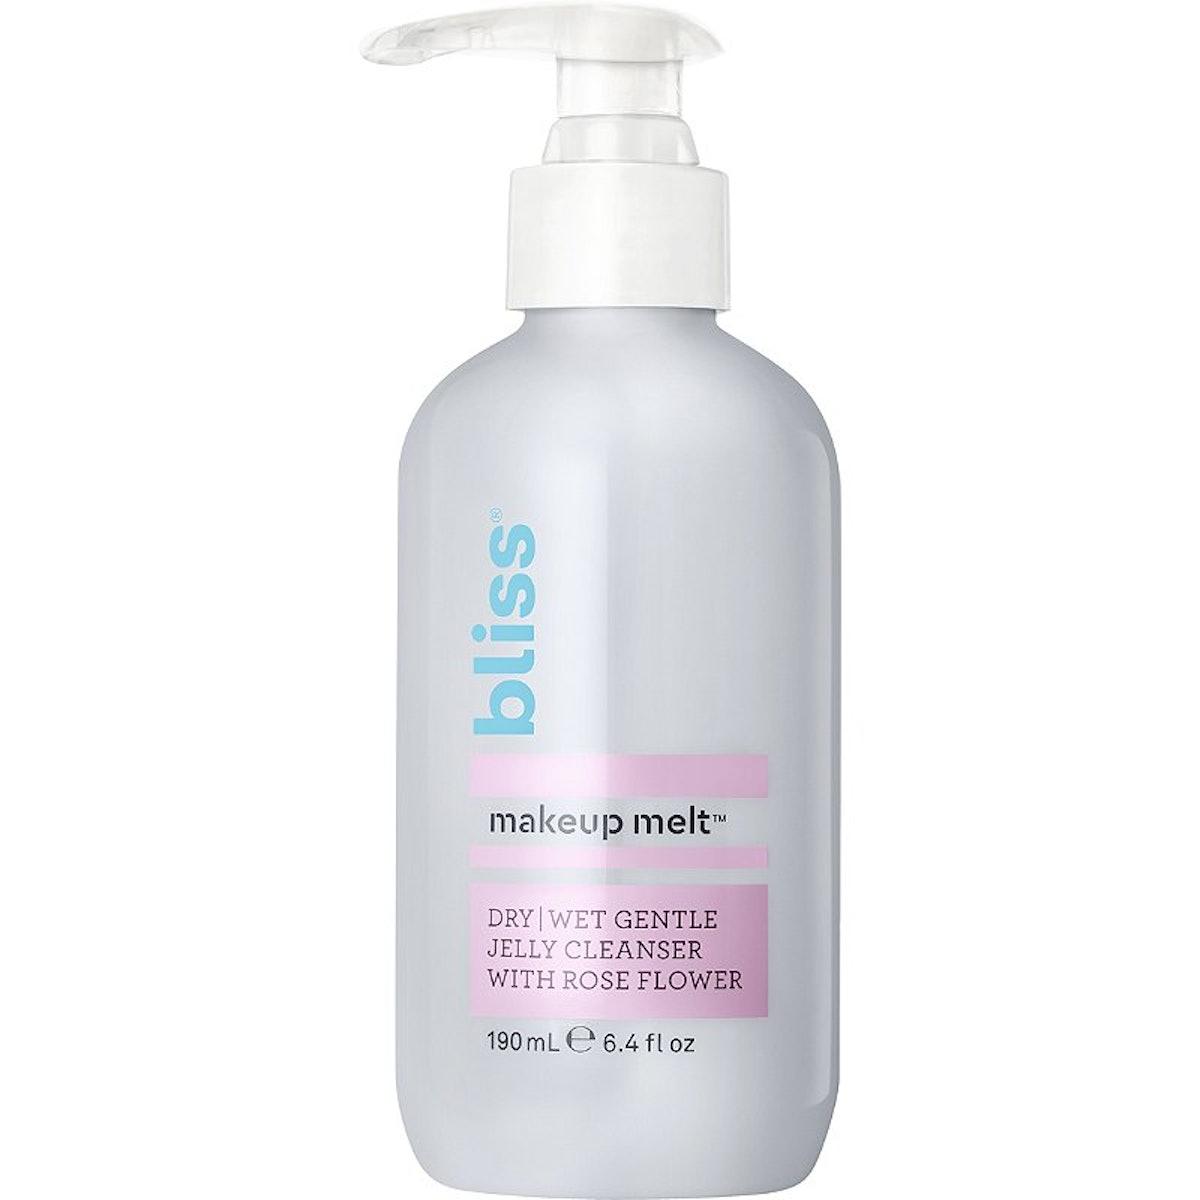 Makeup Melt Jelly Cleanser